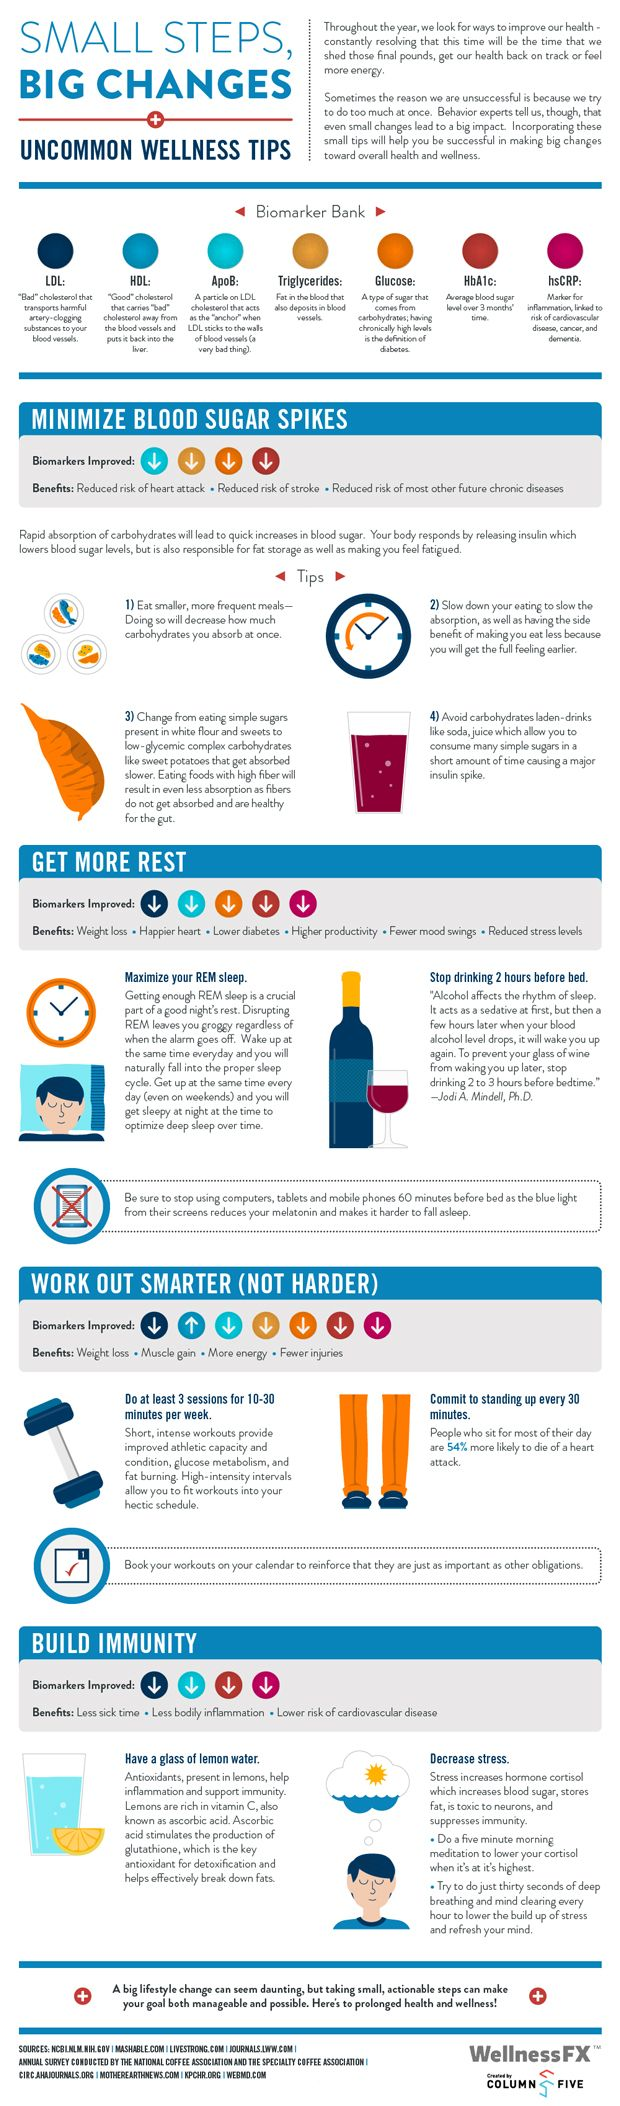 Uncommon wellness tips   info graphic